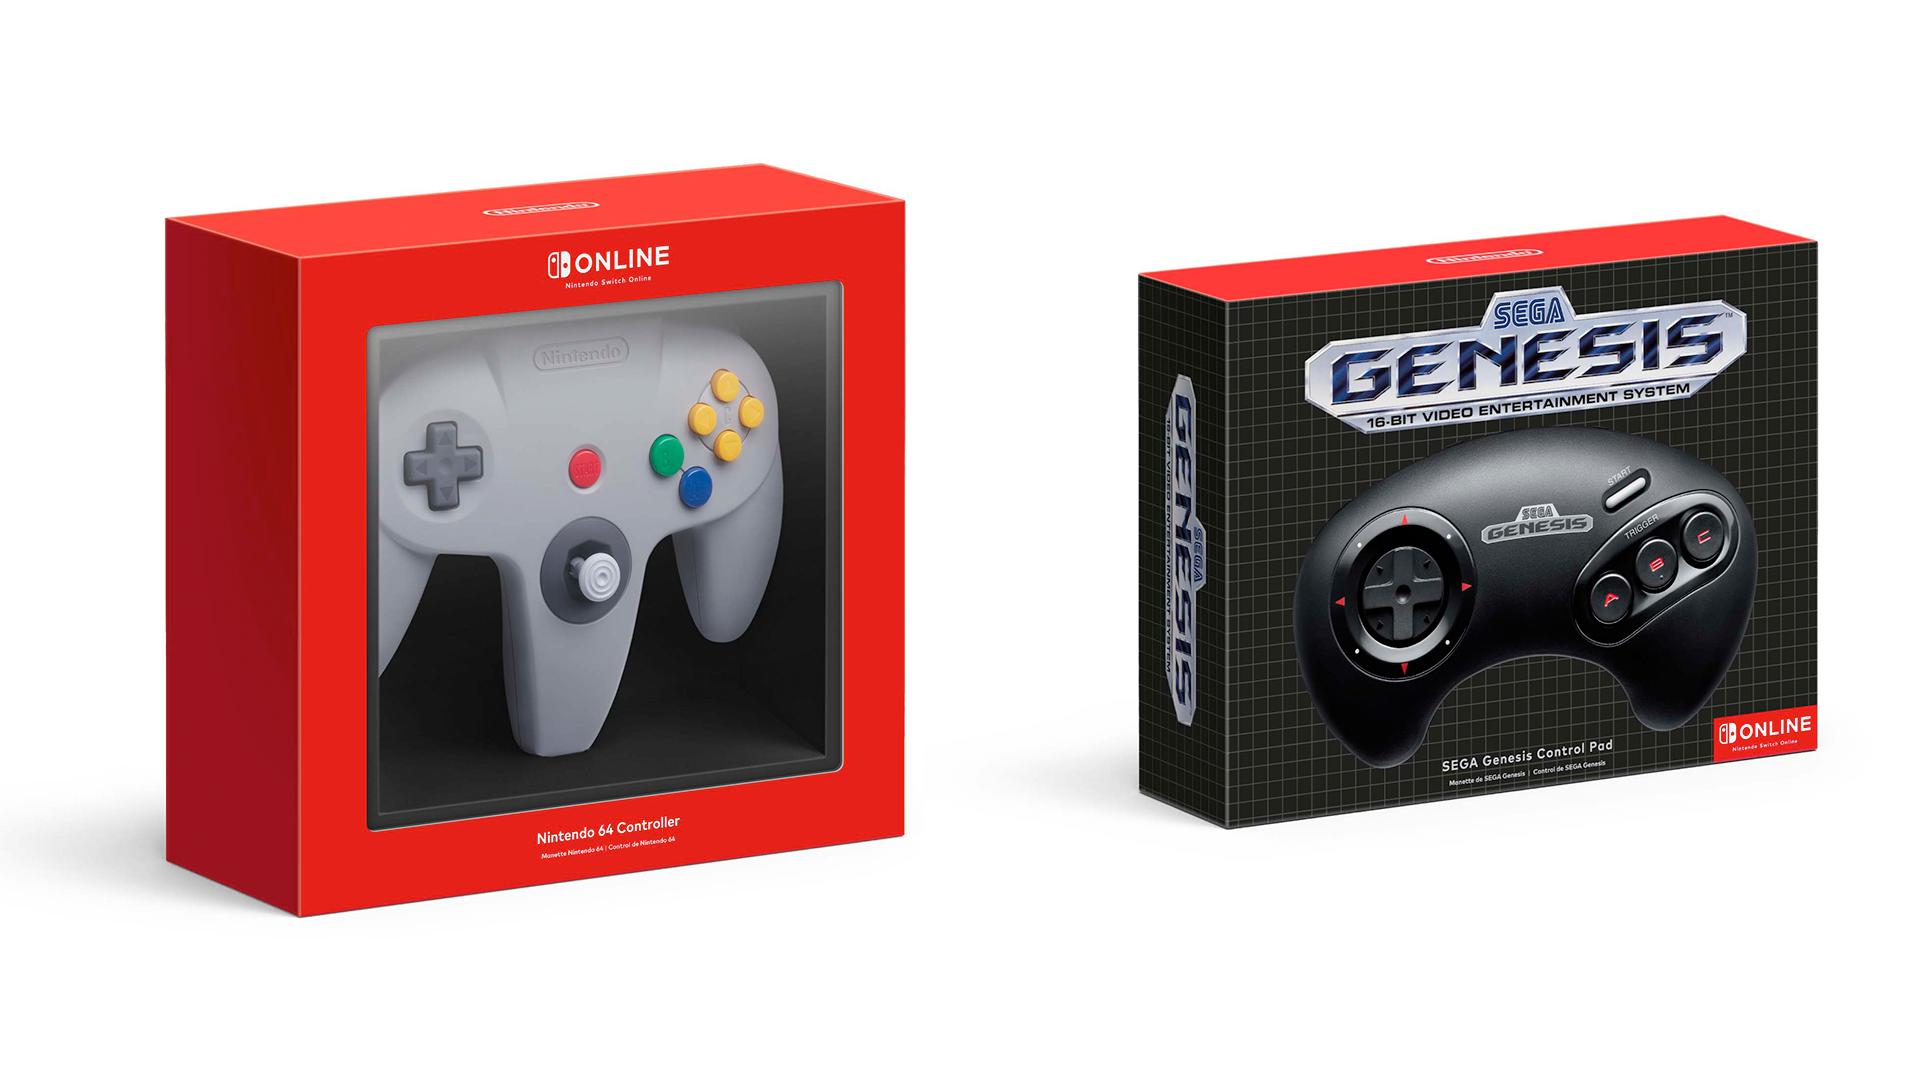 The Nintendo Switch wireless N64 and Sega Genesis controllers.